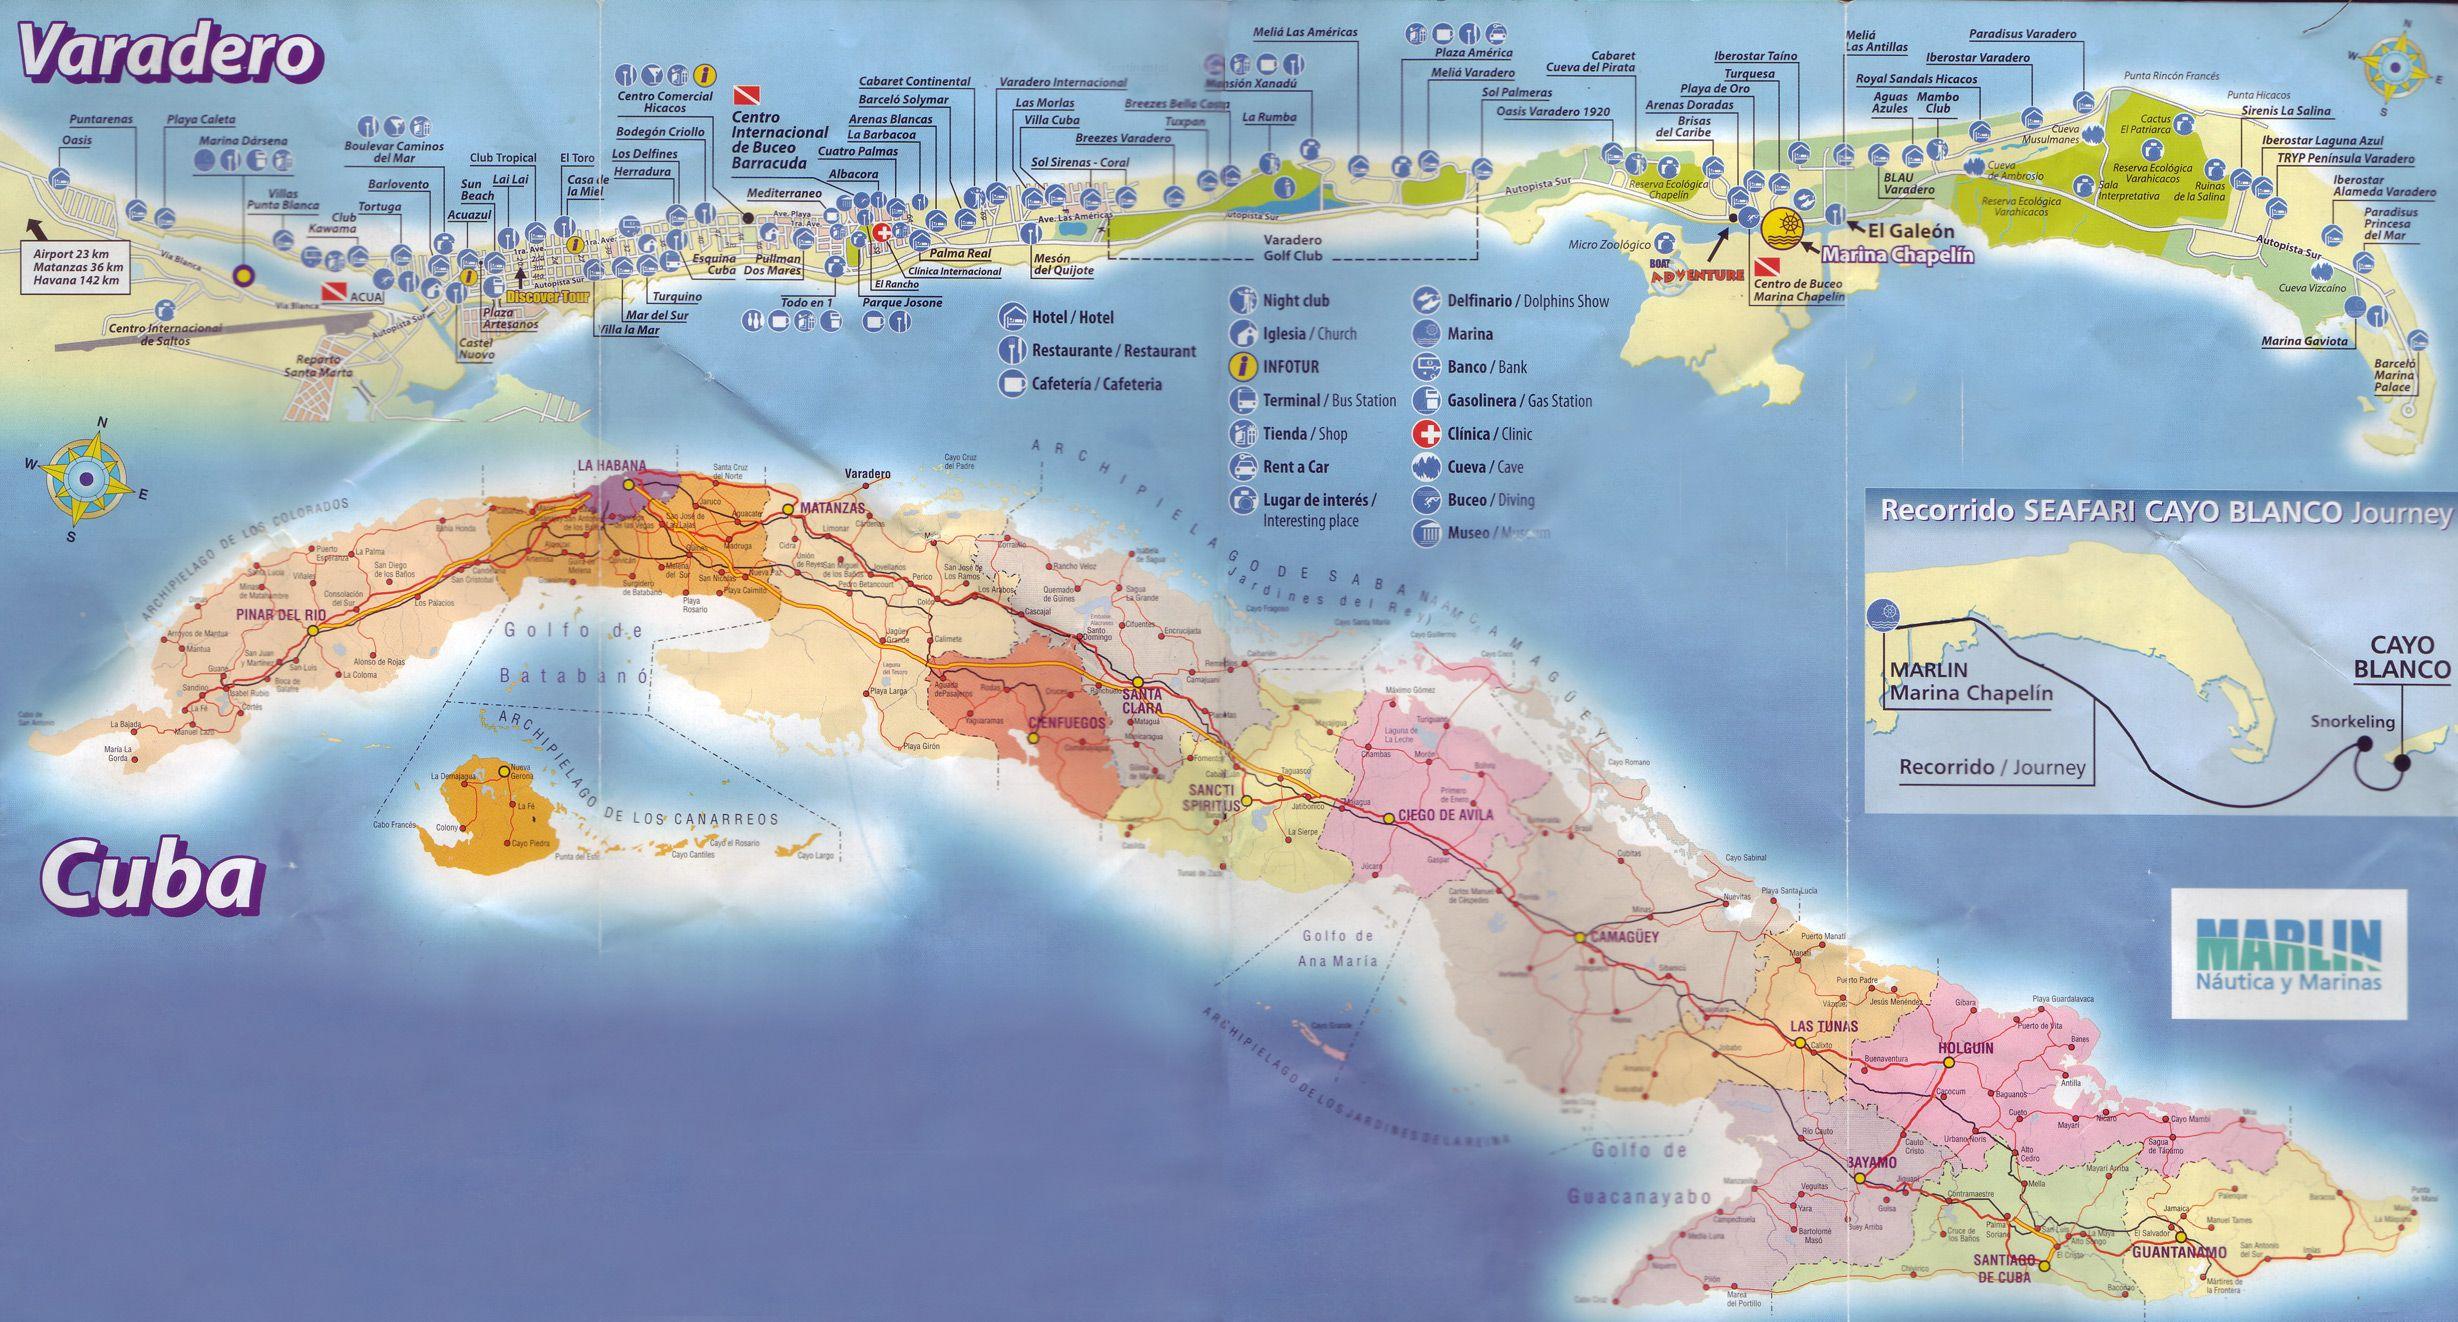 Destination Wedding And Hotel Review In Varadero Cuba